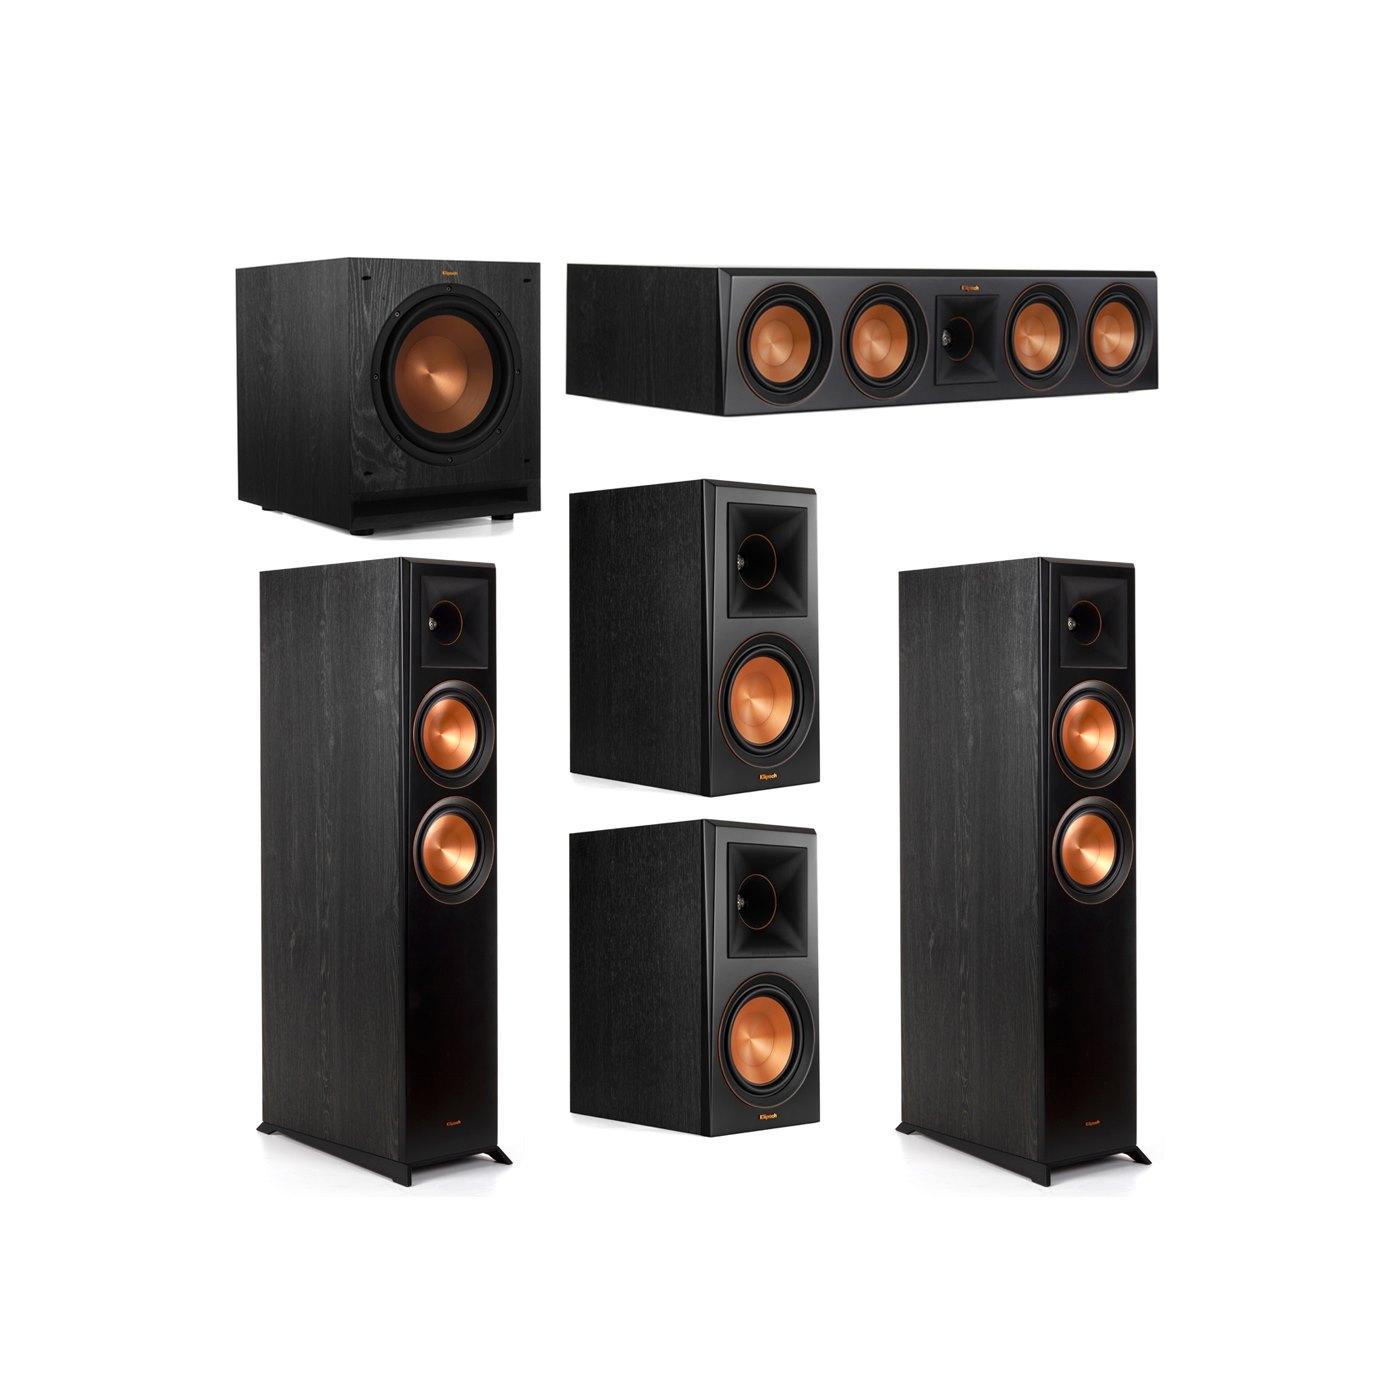 Klipsch 5.1 System with 2 RP-6000F Floorstanding Speakers, 1 Klipsch RP-504C Center Speaker, 2 Klipsch RP-600M Surround Speakers, 1 Klipsch SPL-100 Subwoofer